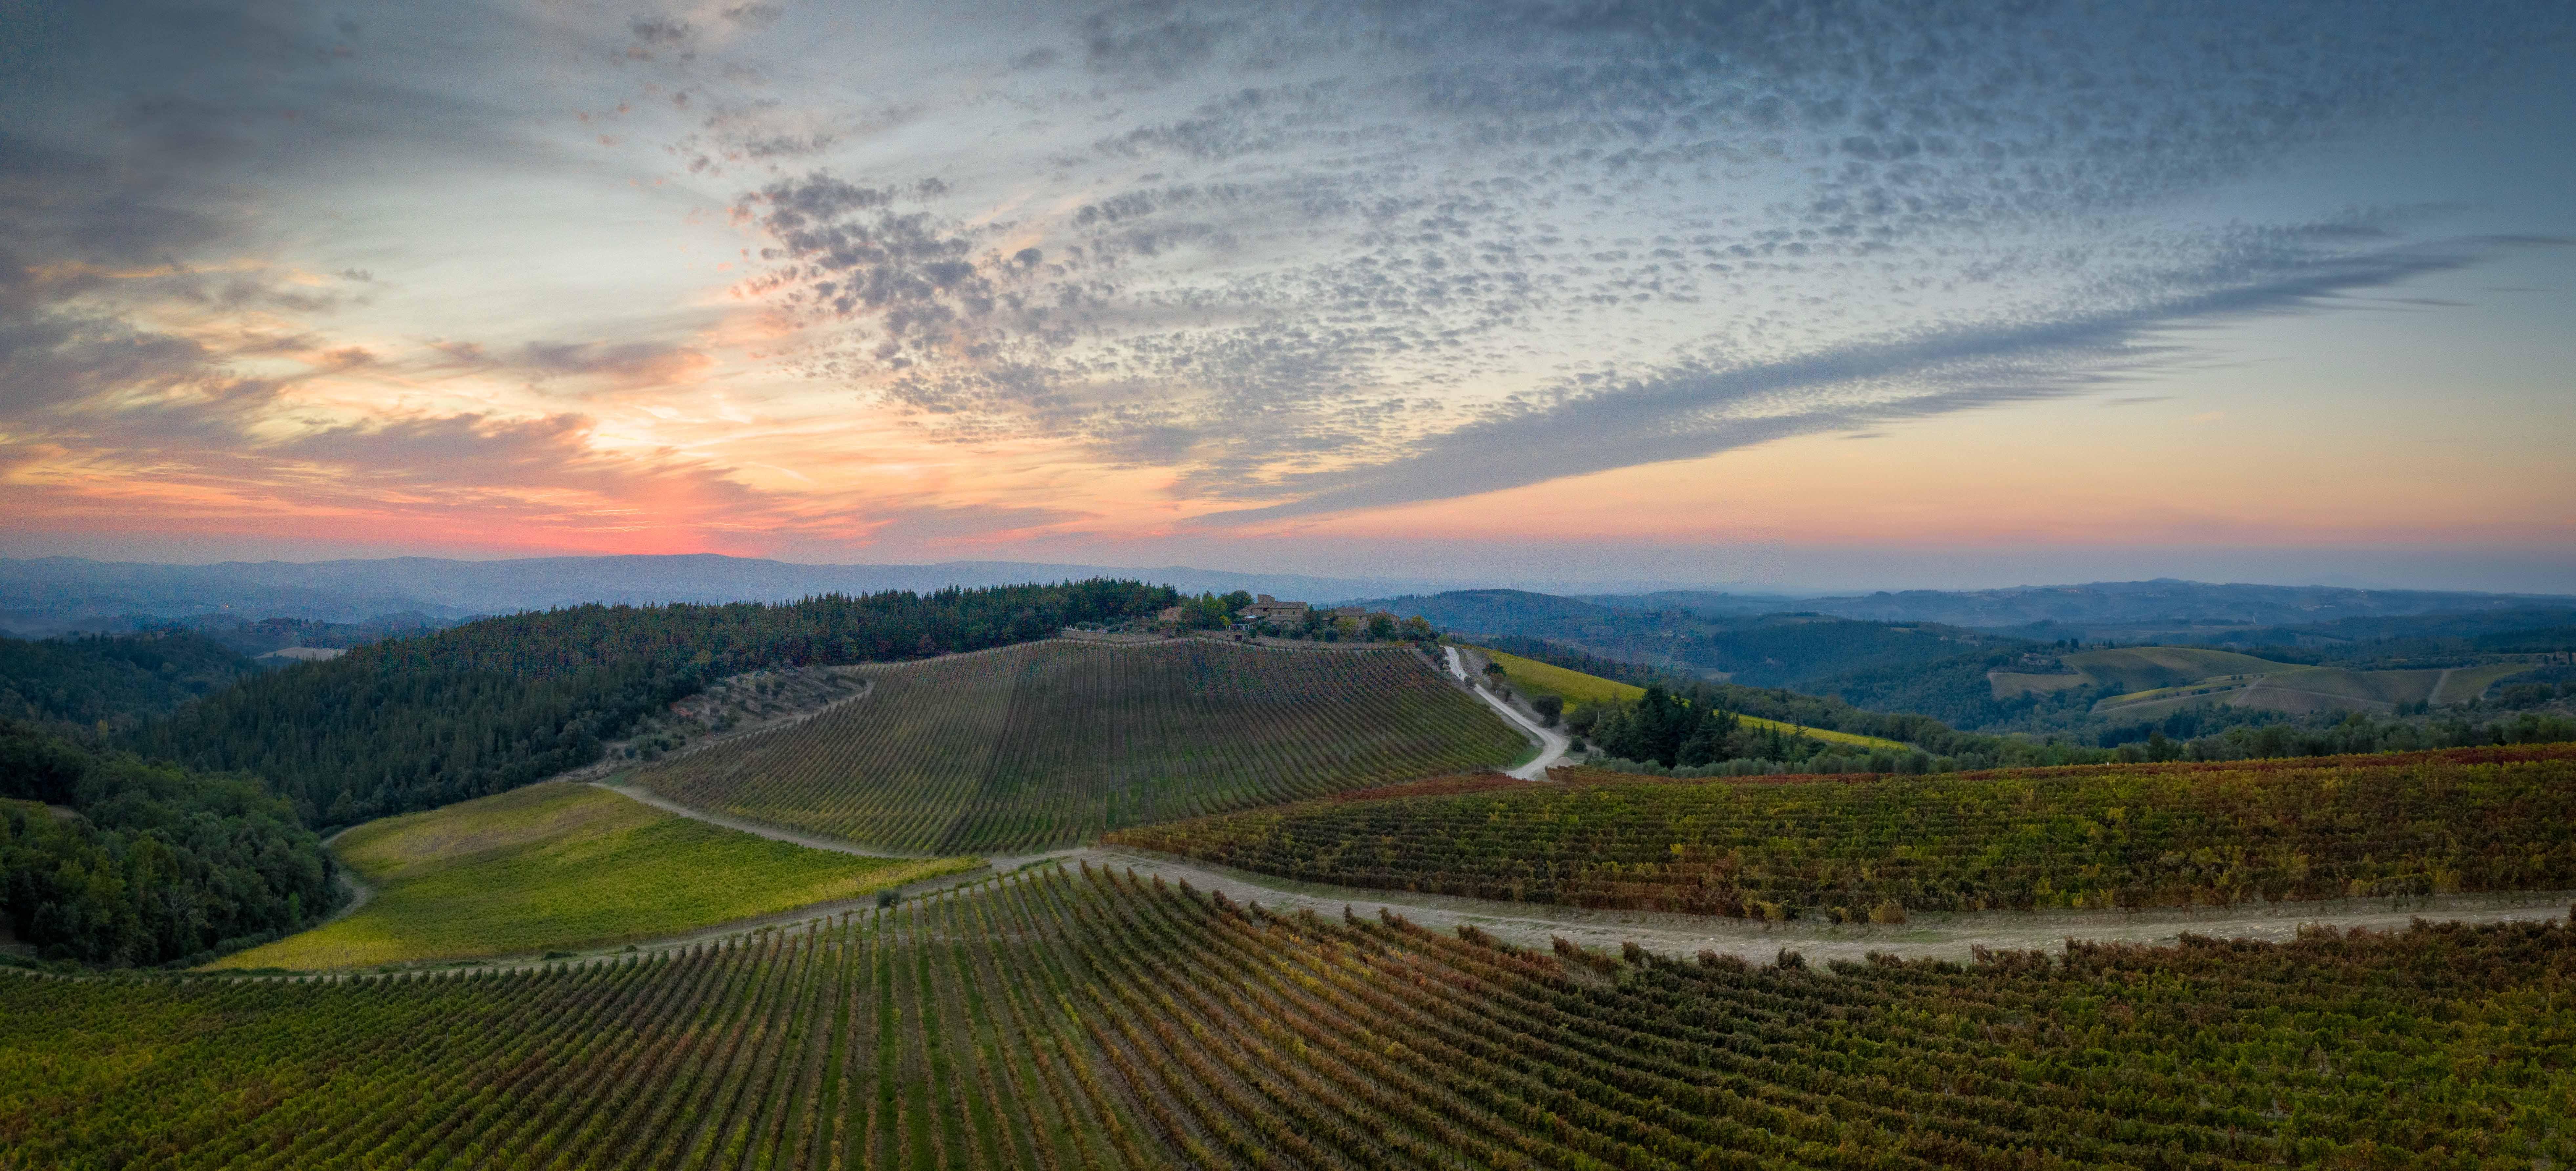 Tuscany-4.jpg